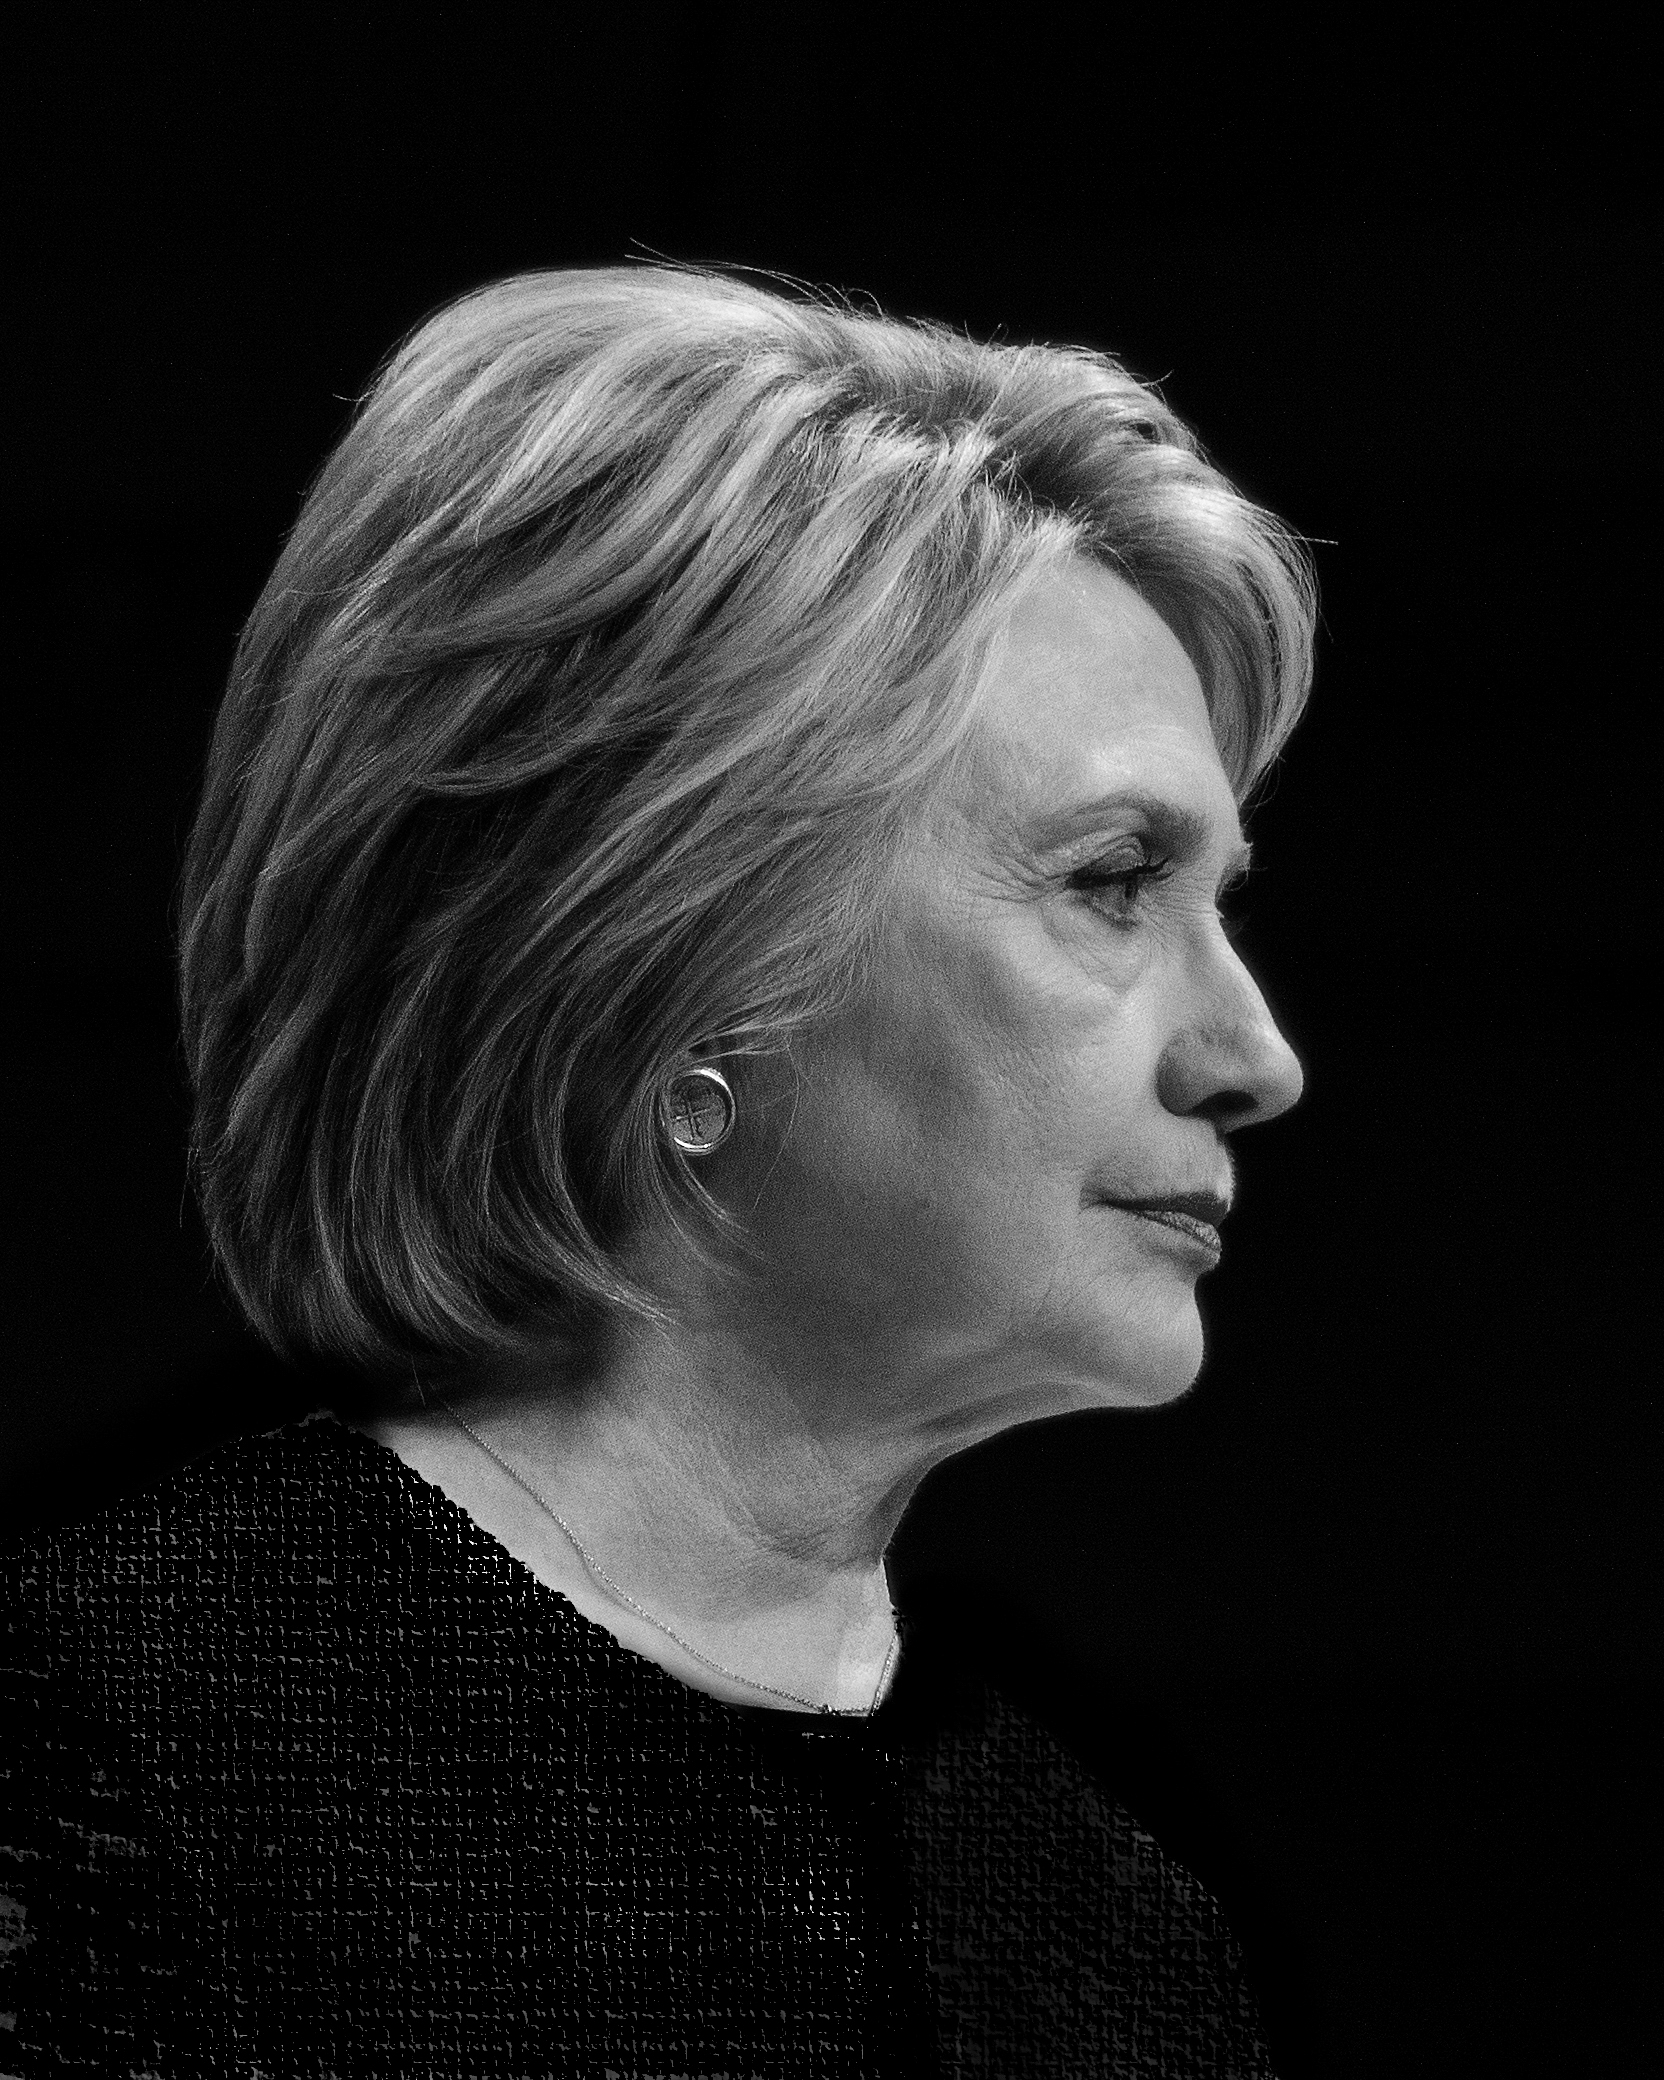 Hillary Clinton Portrait 22